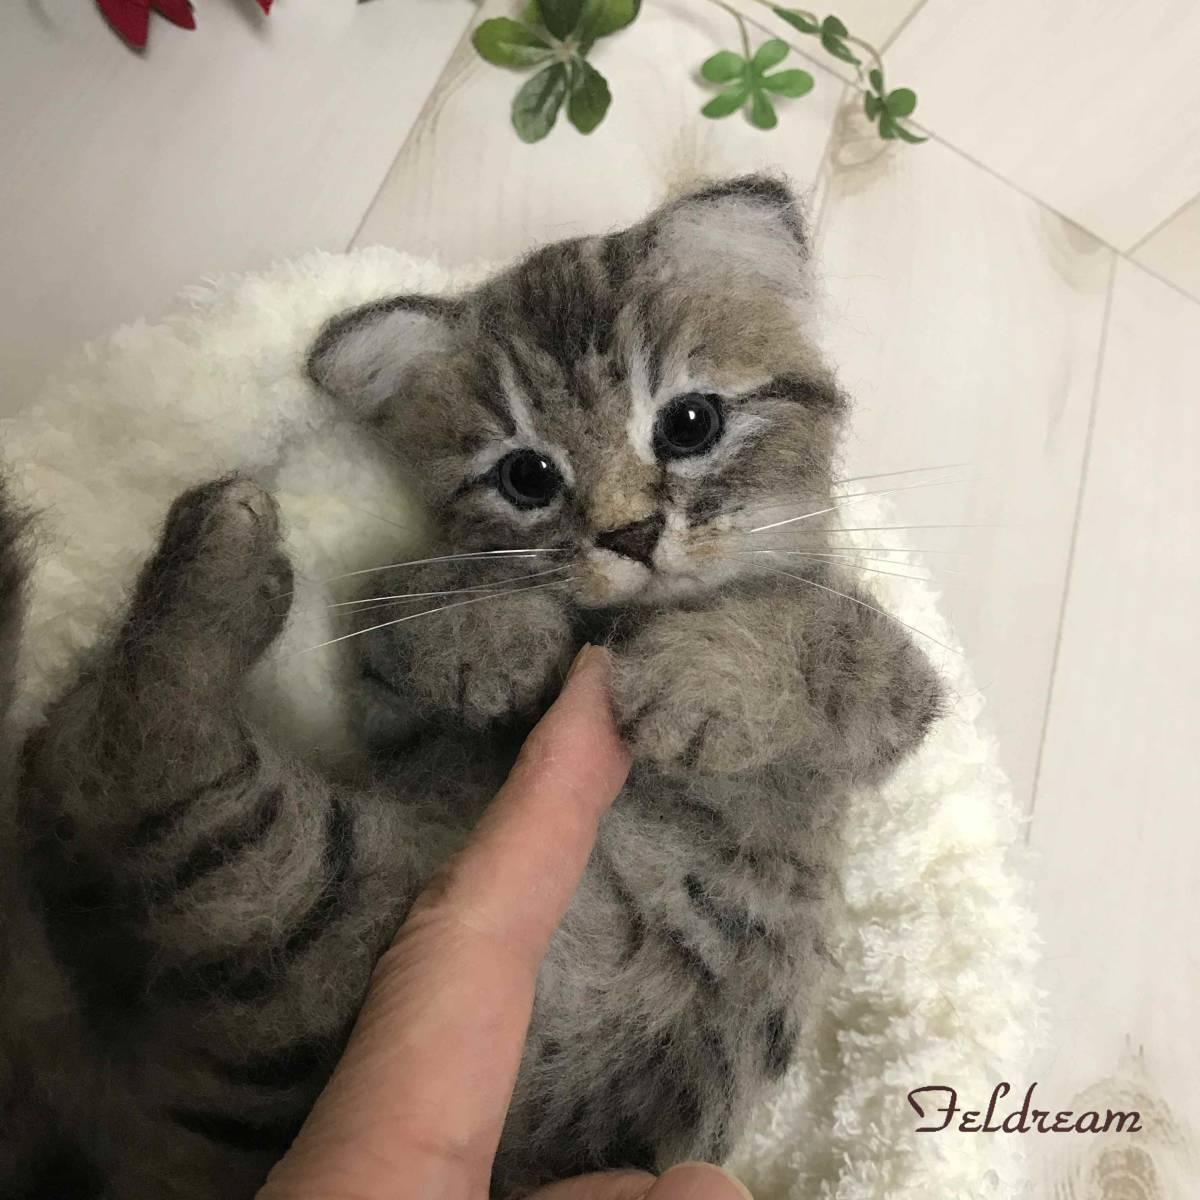 Feldream◆羊毛フェルト猫 ごろにゃん♪ キジトラ子猫 《実物大》 ハンドメイド_画像3